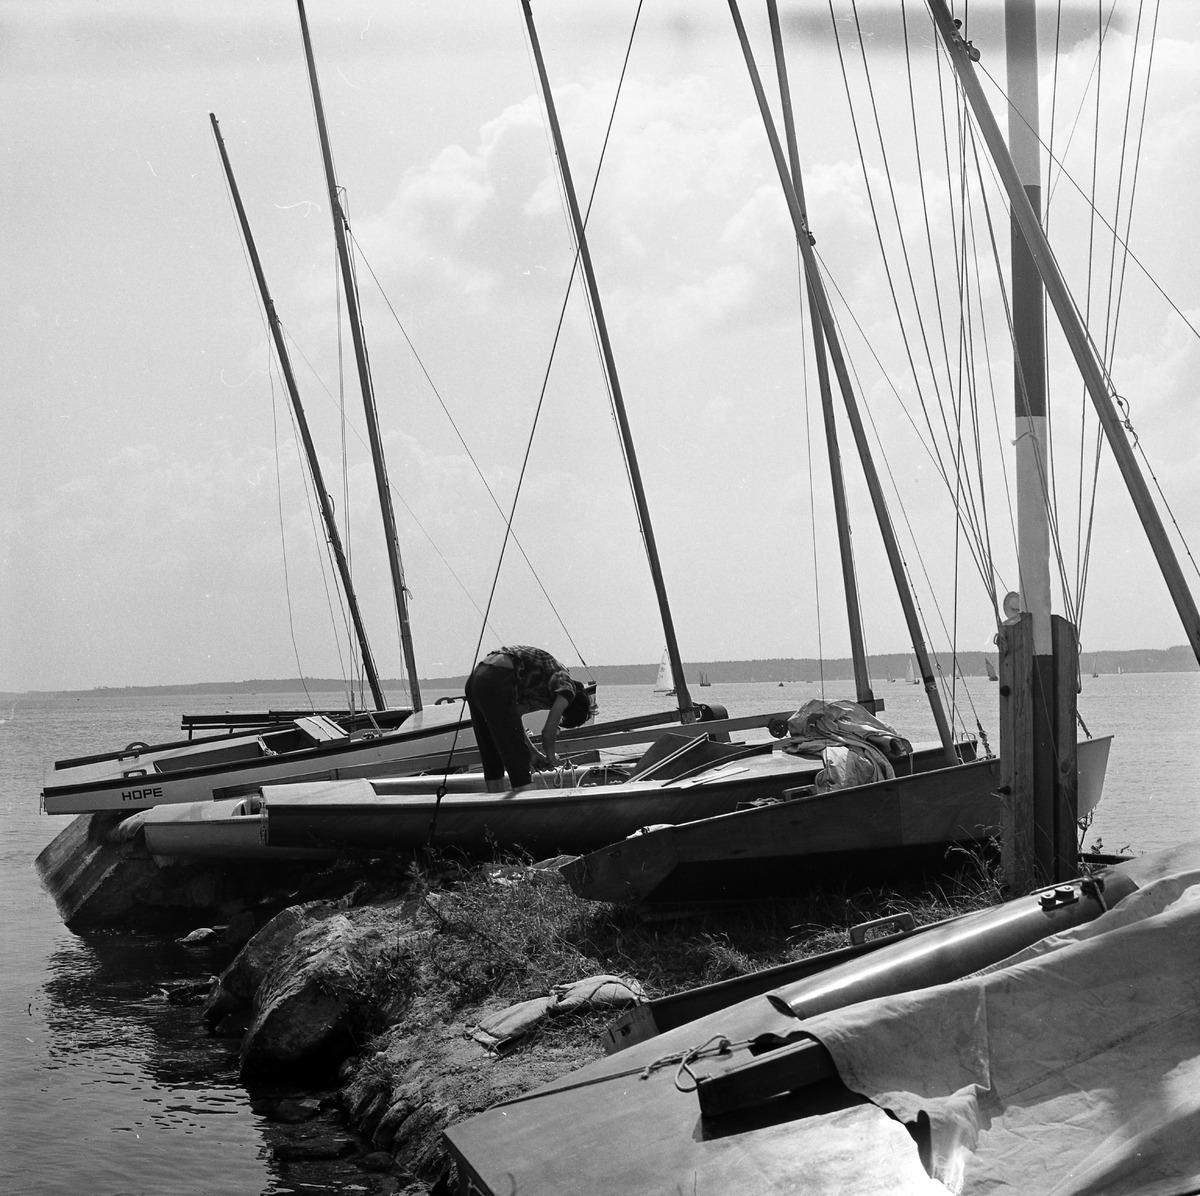 Łódki regatowe [1]